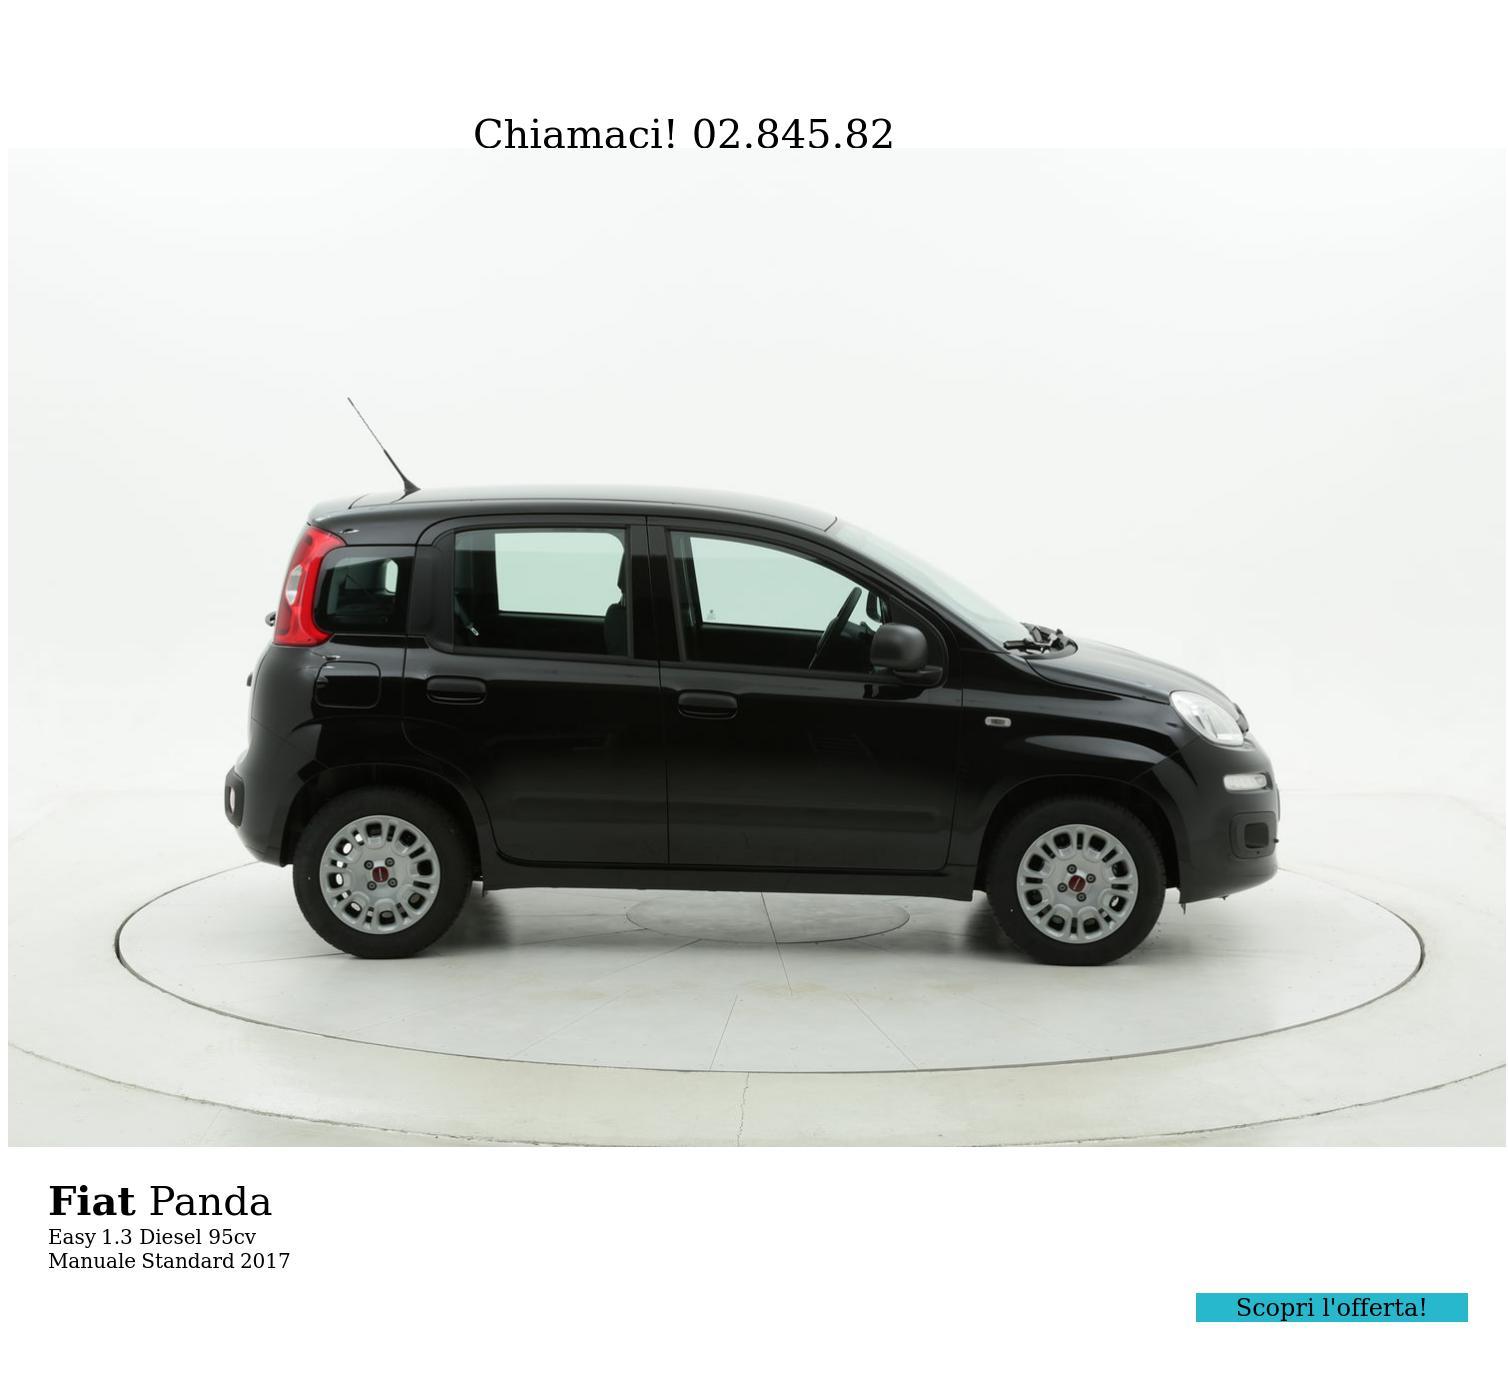 Fiat Panda Easy km 0 diesel nera   brumbrum